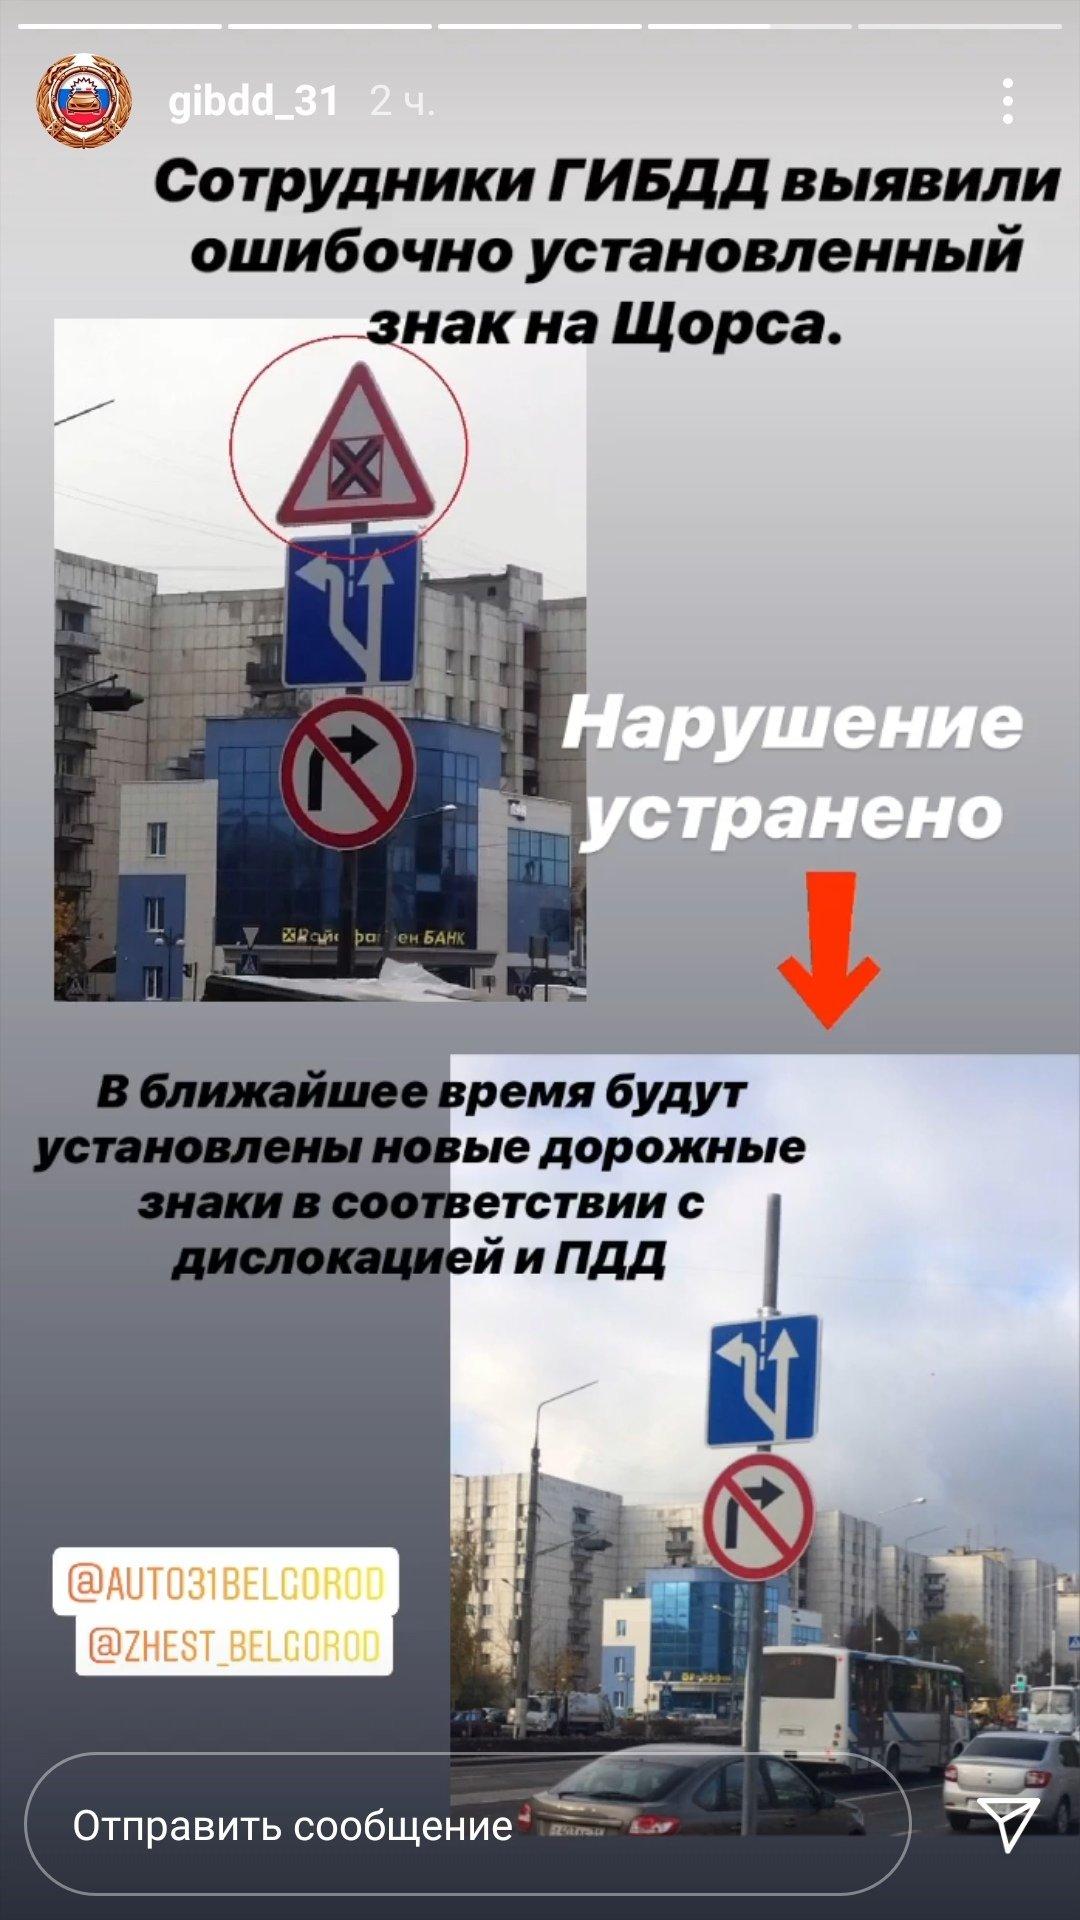 Комментарий ГИБДД о знаке на Щорса, Instagram-аккаунт ГИБДД